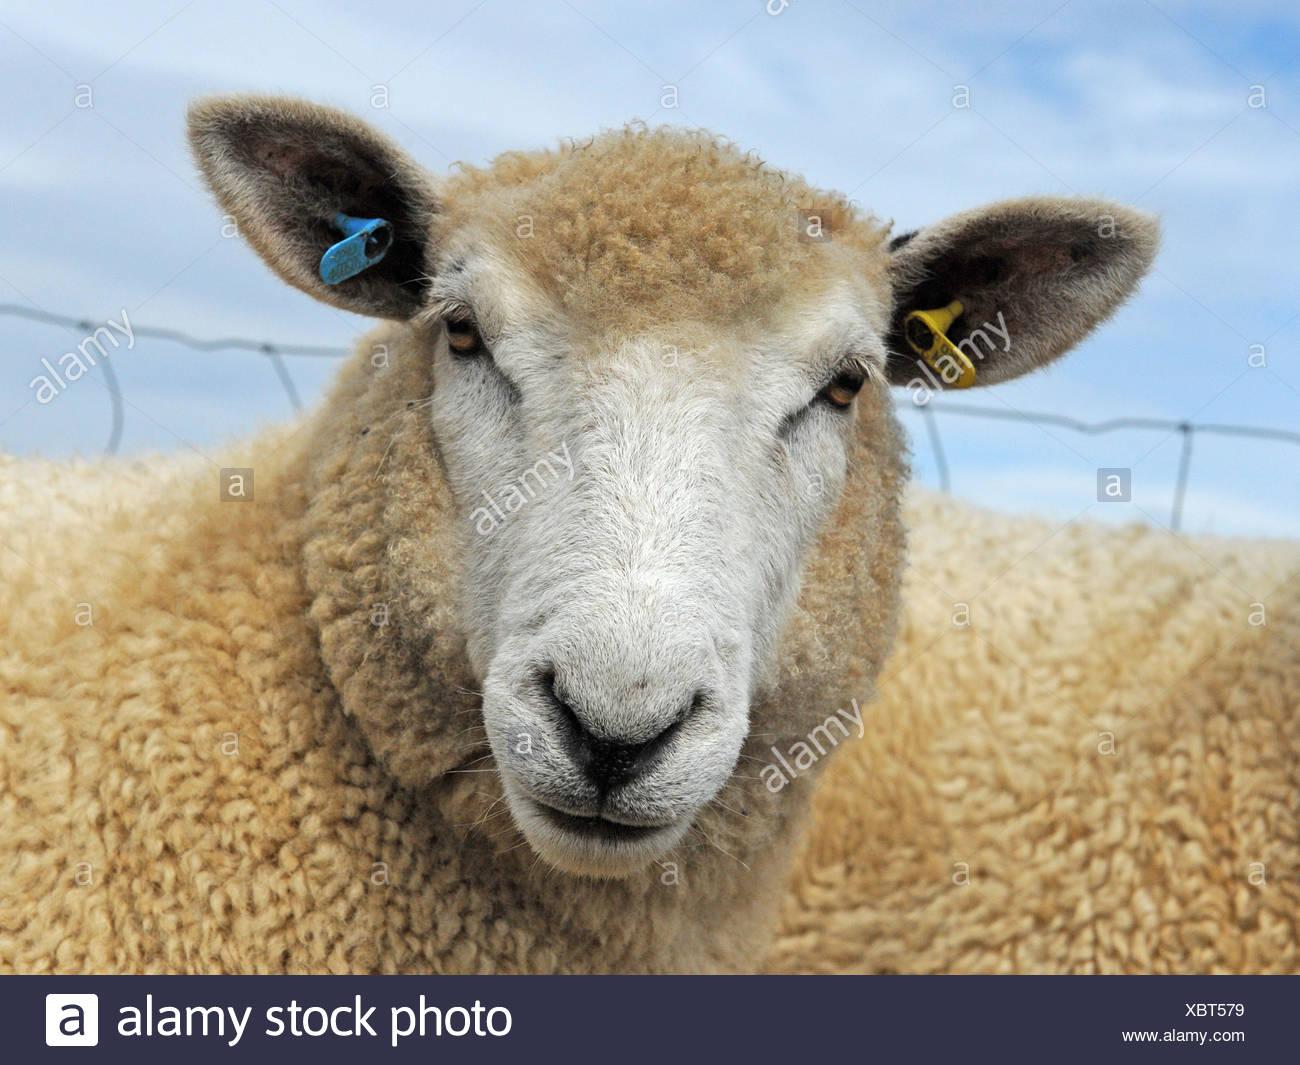 An angry looking sheep with light brown fleece - Stock Image